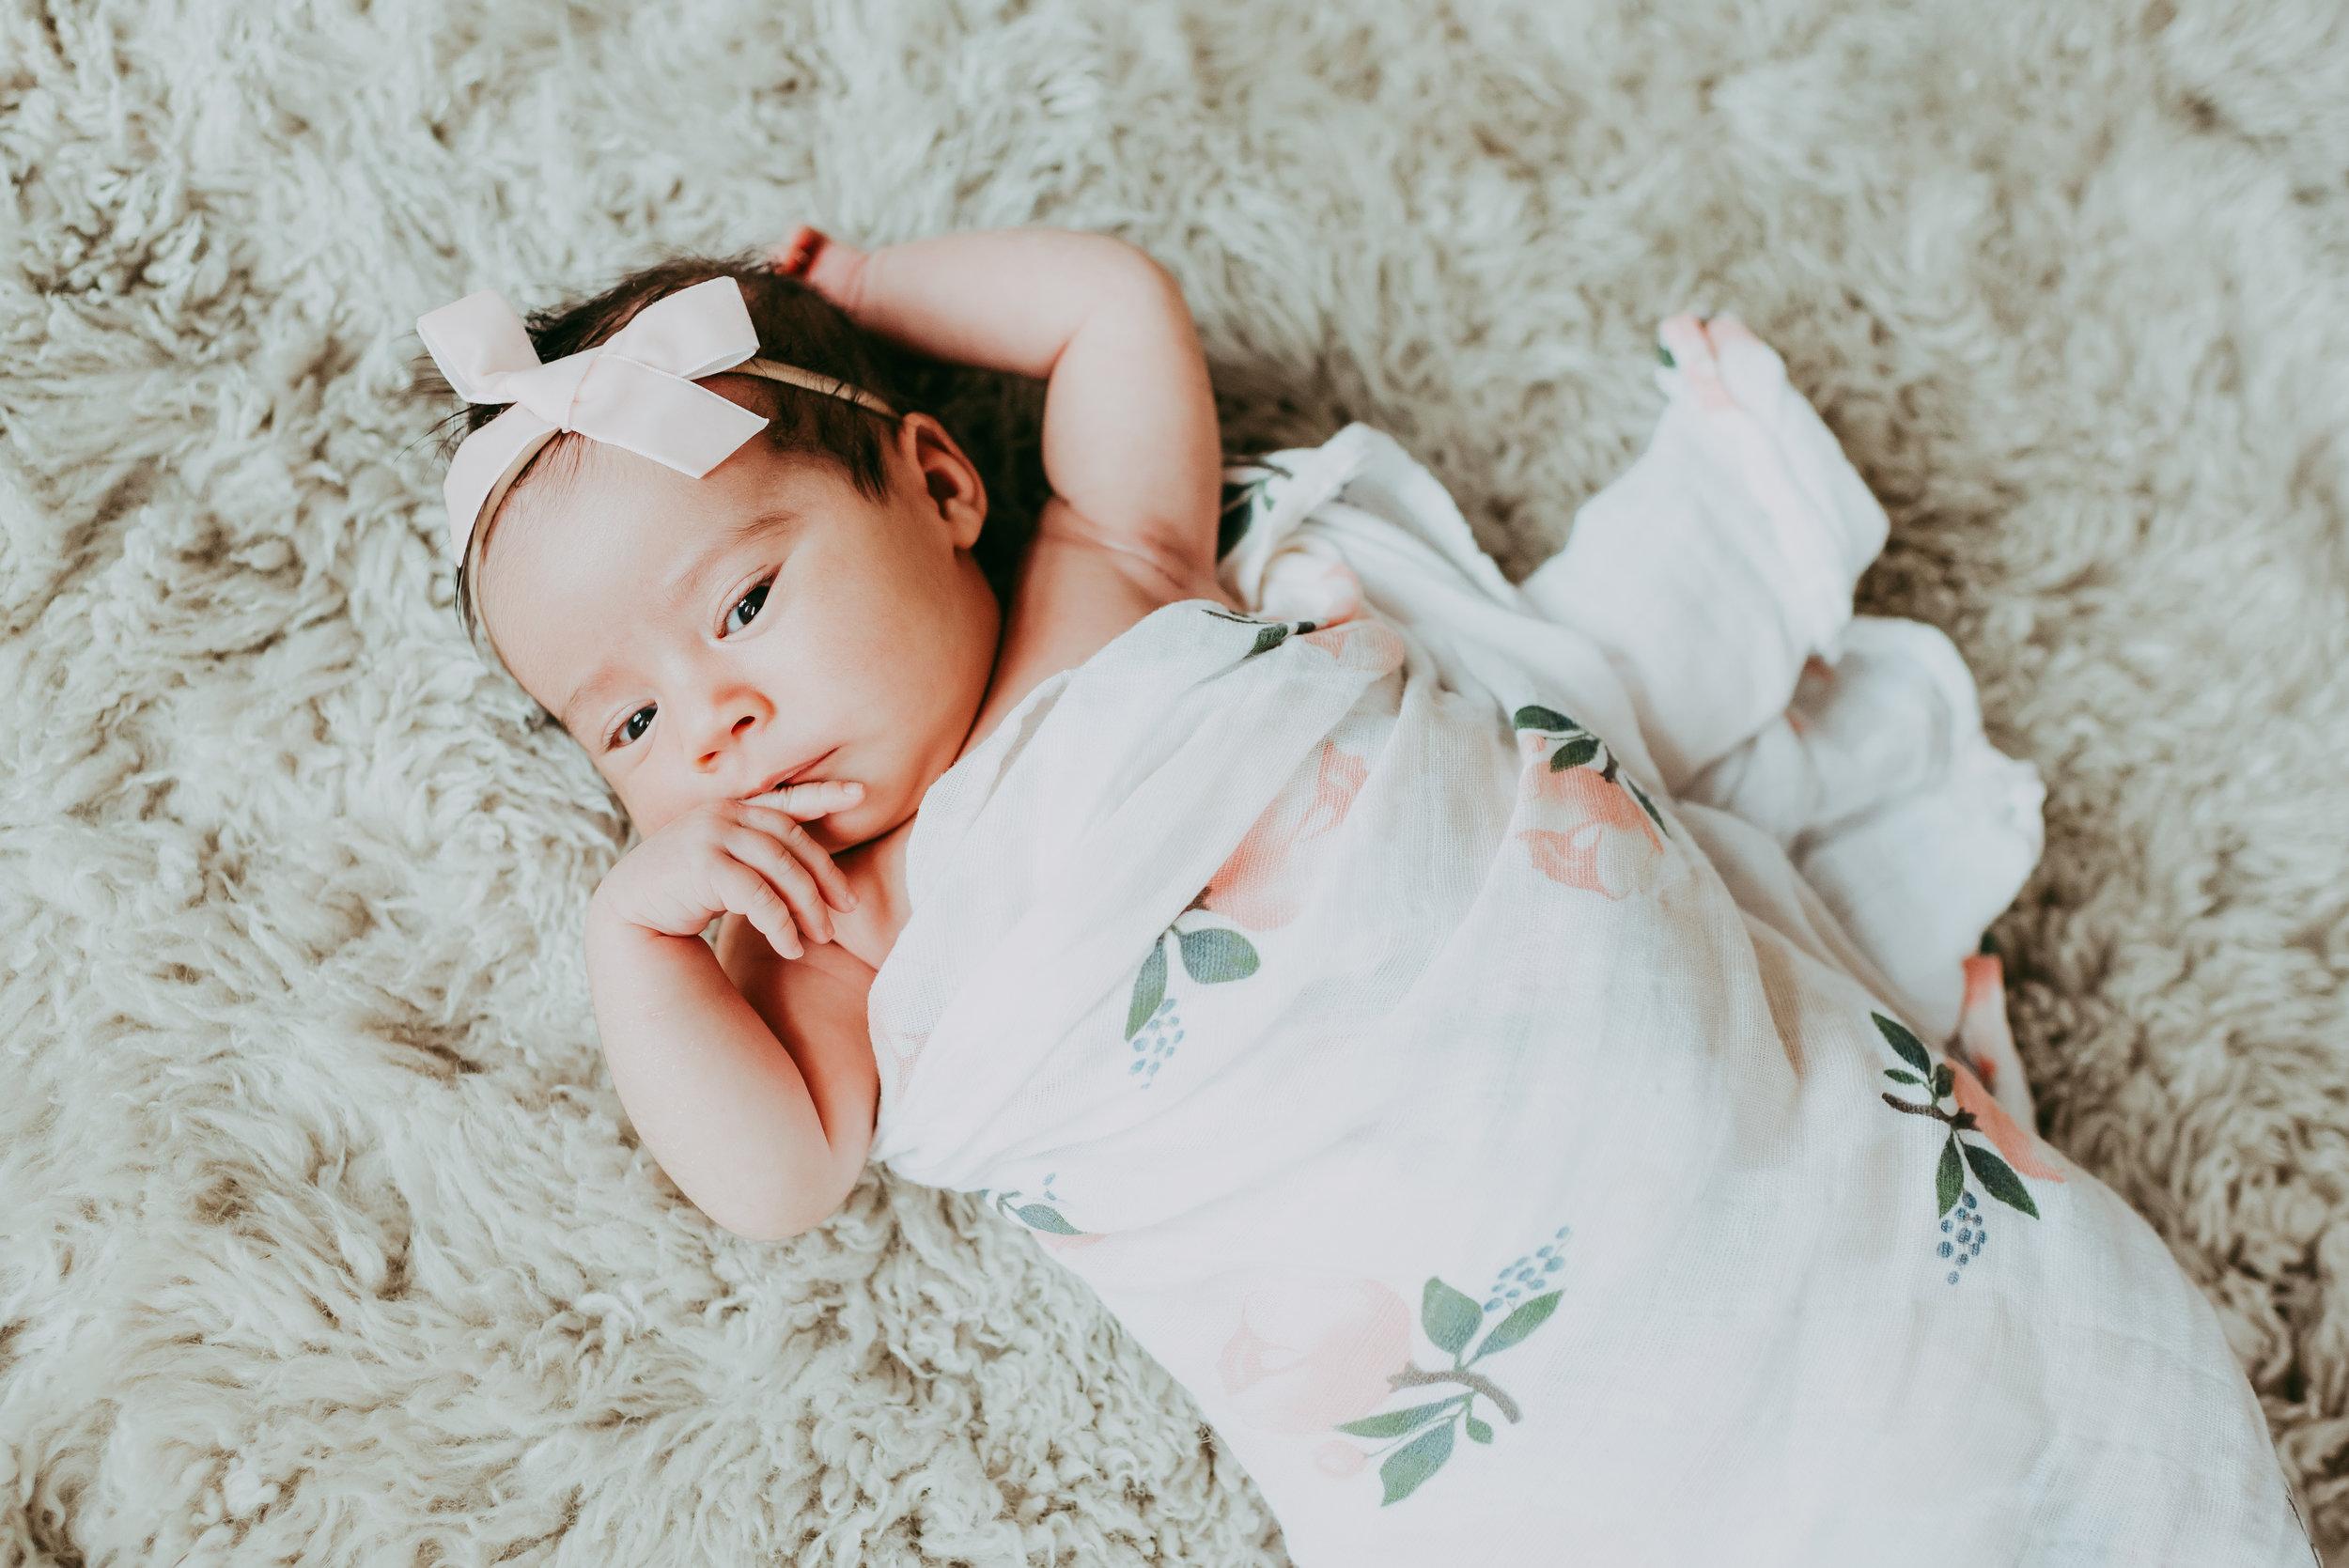 BabyGia_StoriedPhotography-131.jpg